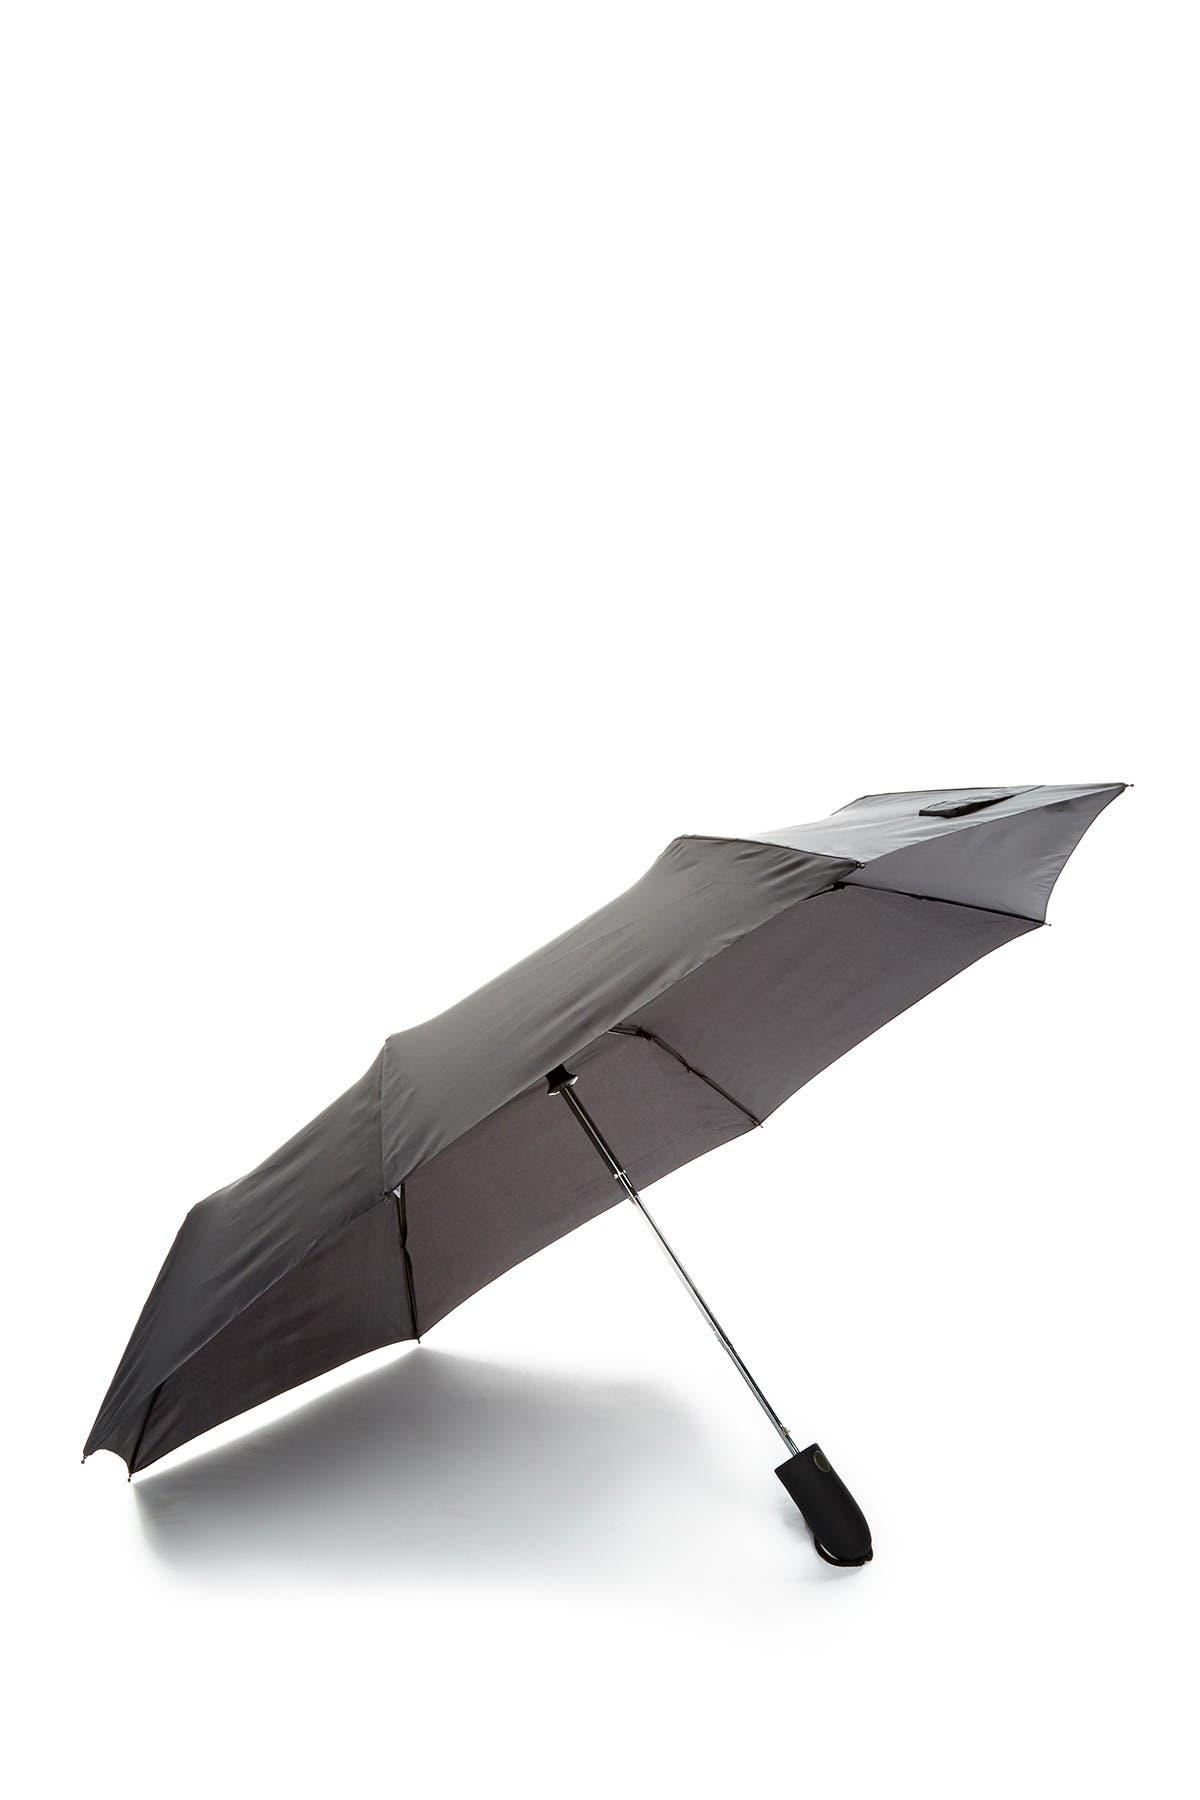 Image of Nordstrom Rack Folding Umbrella